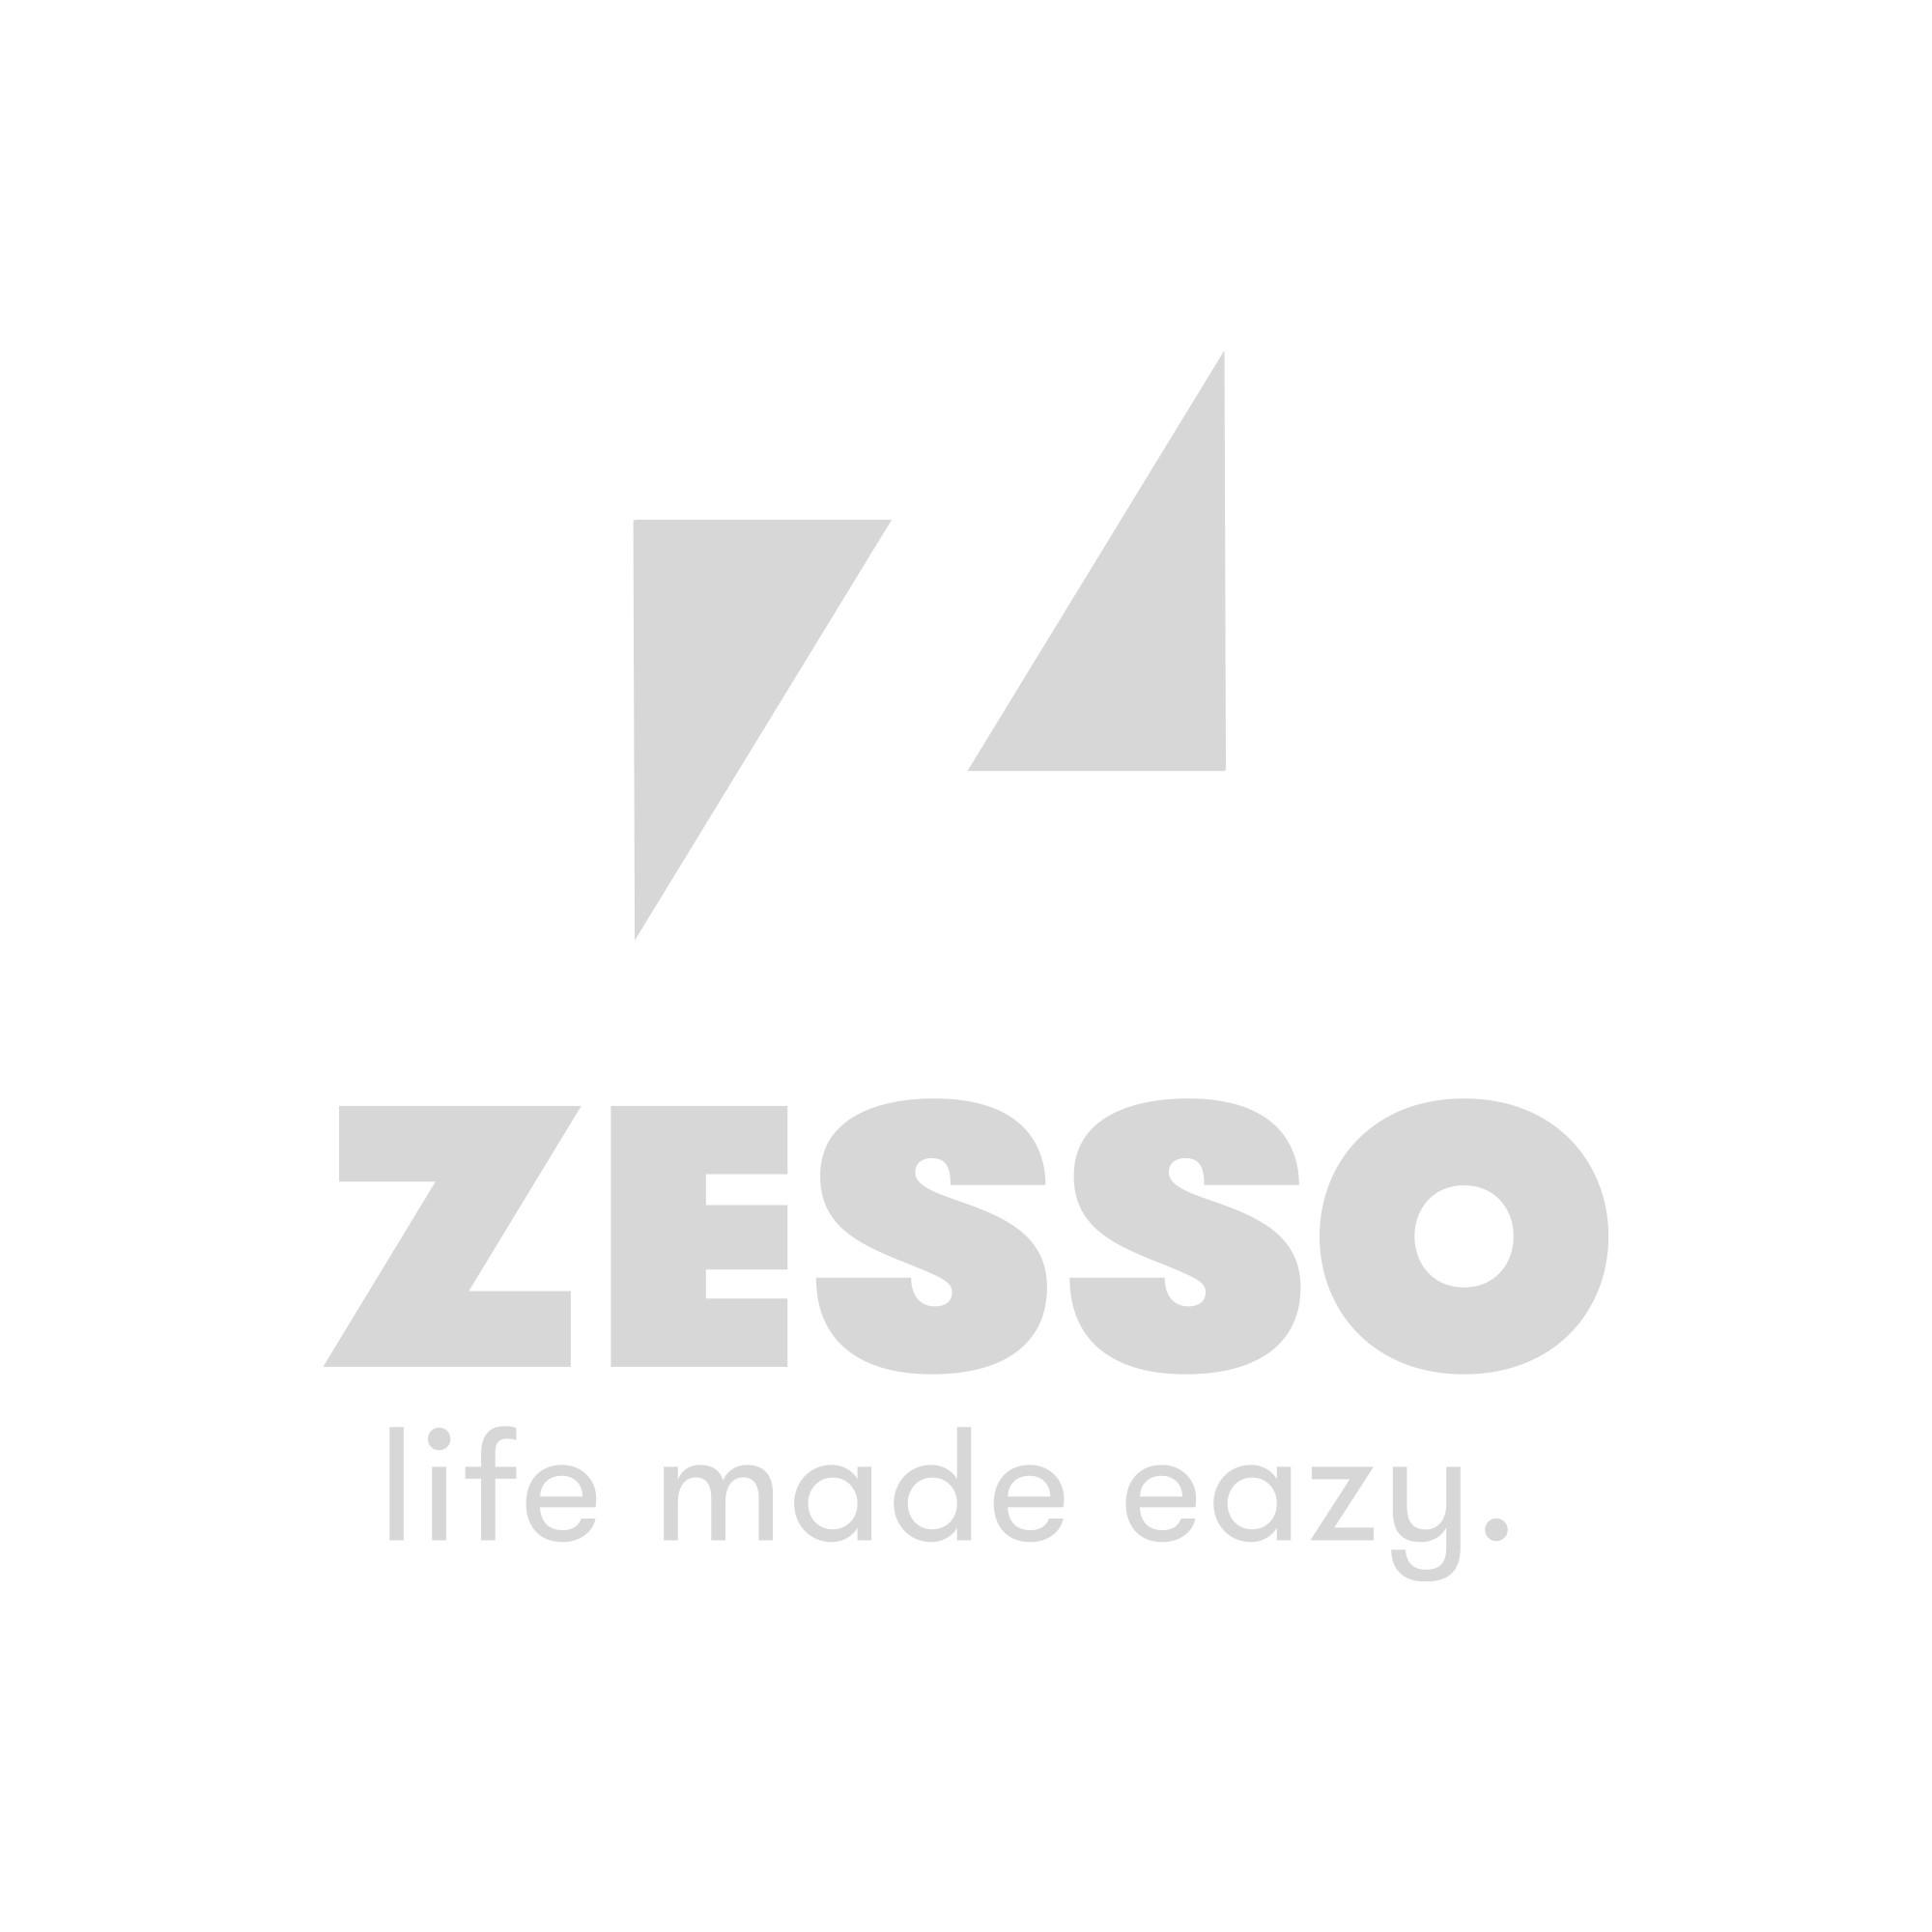 Kleine Wolke Douchegordijn Sonny Blauw - 180 cm x 200 cm